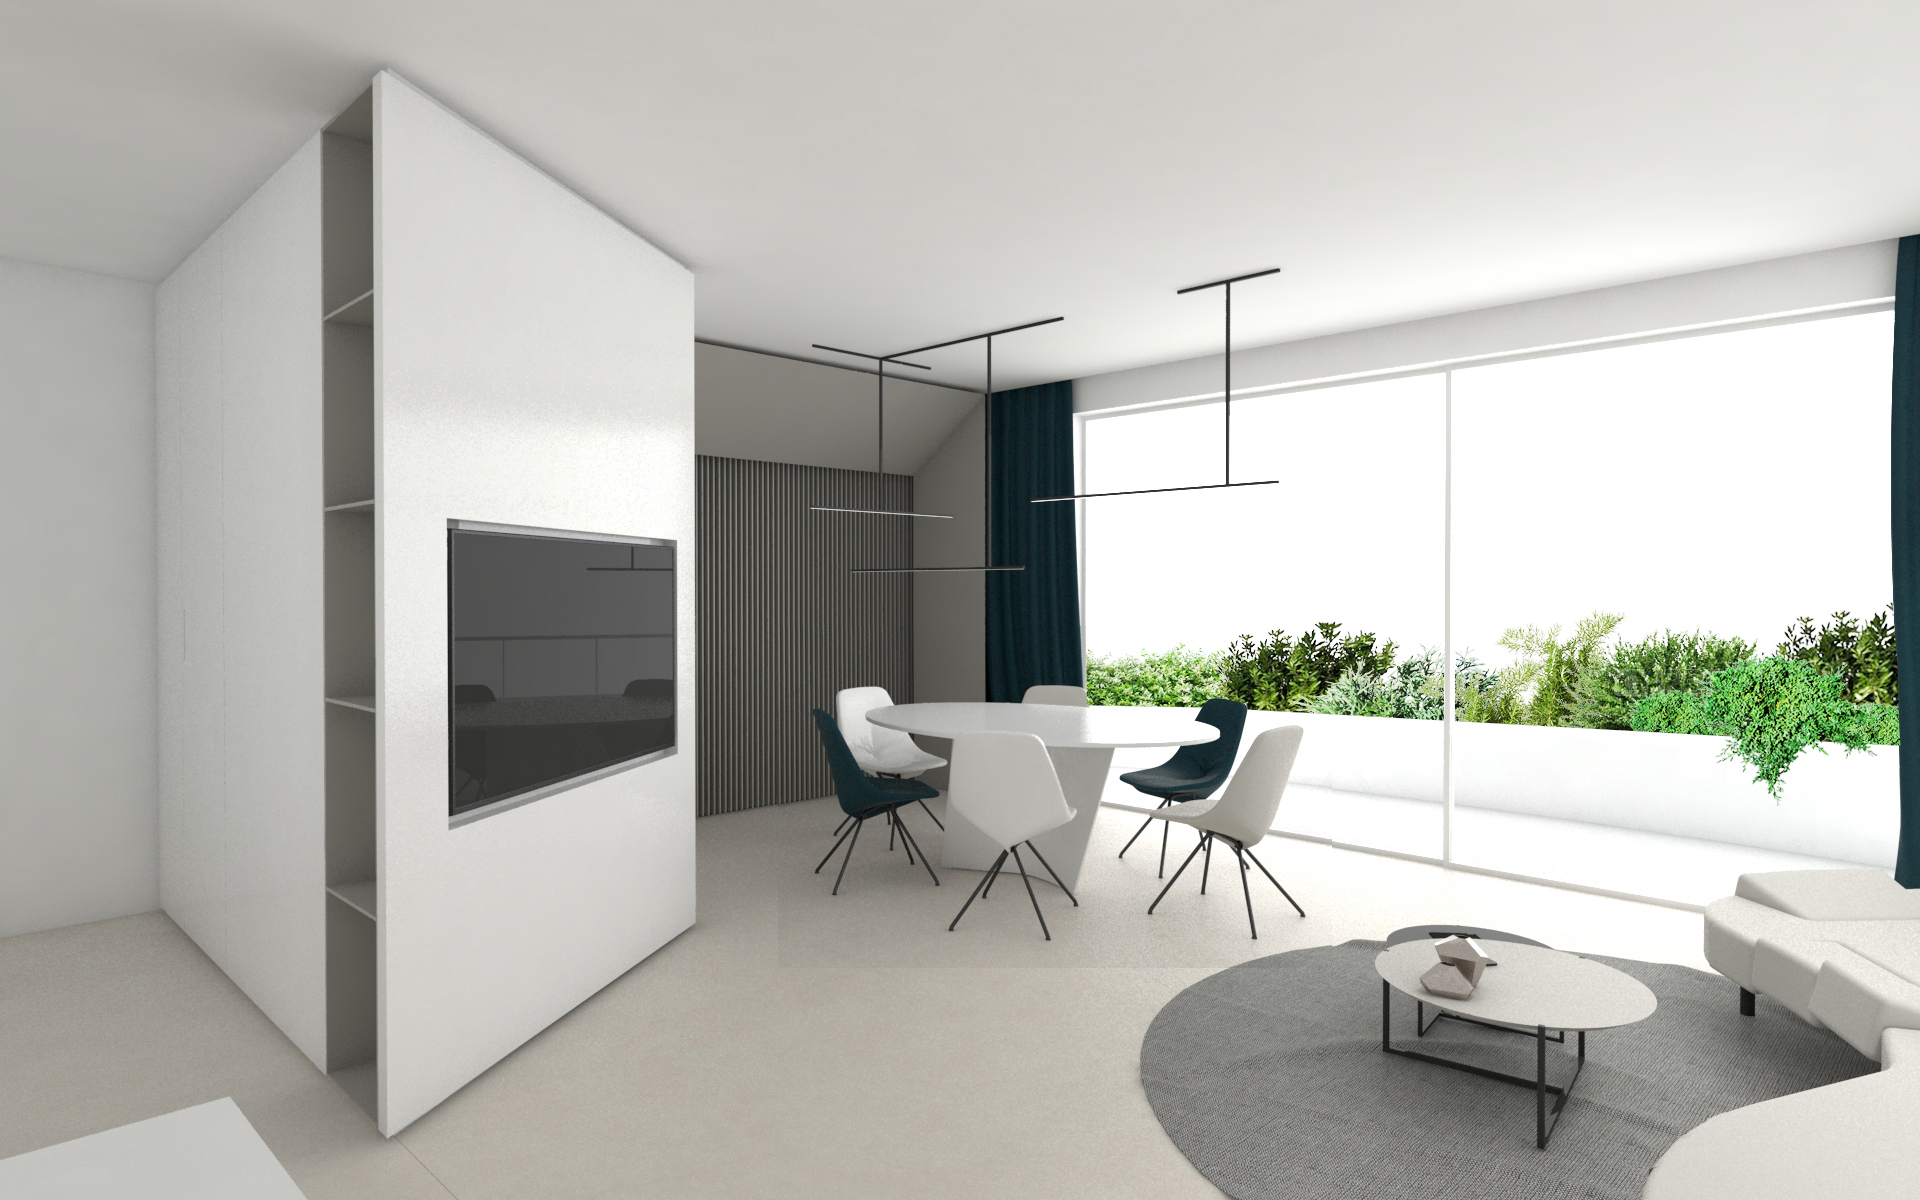 Casa-MR-_-DFG-Architetti-Associati-1